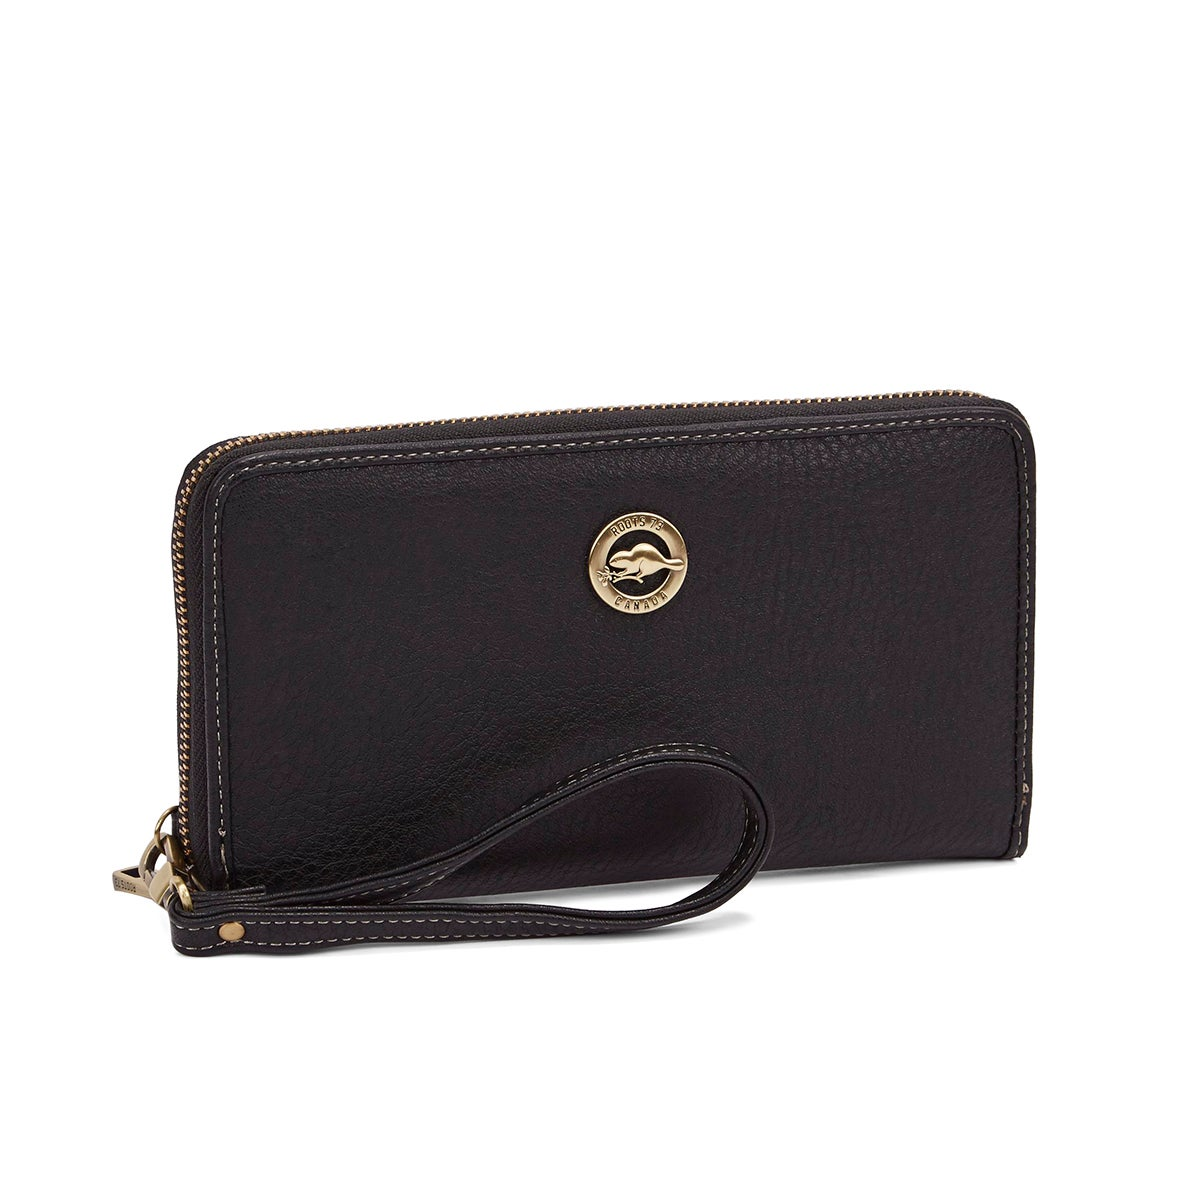 Lds Kipik black large wallet